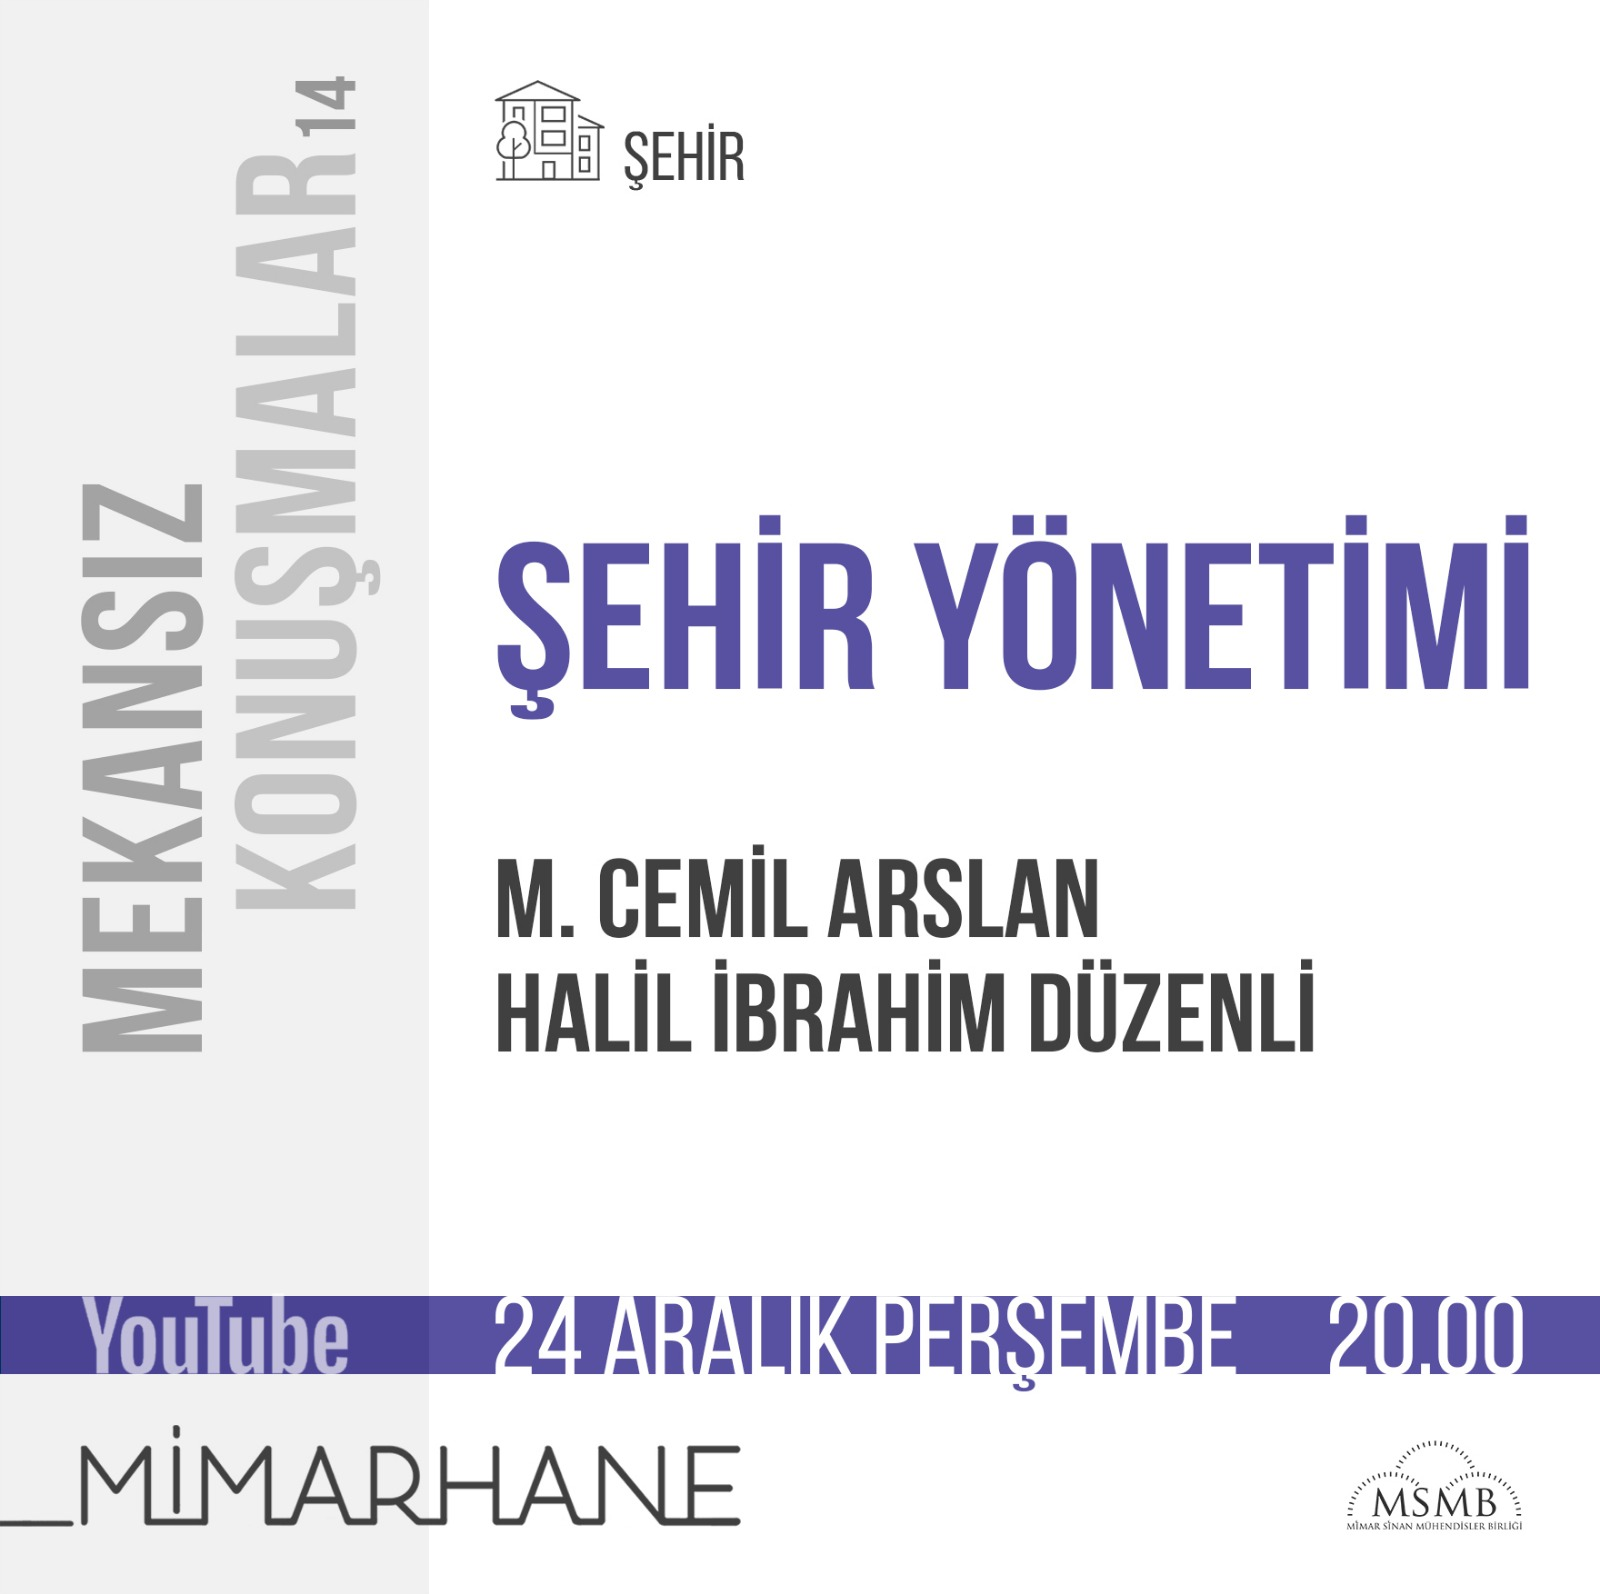 Sehir Yonetimi